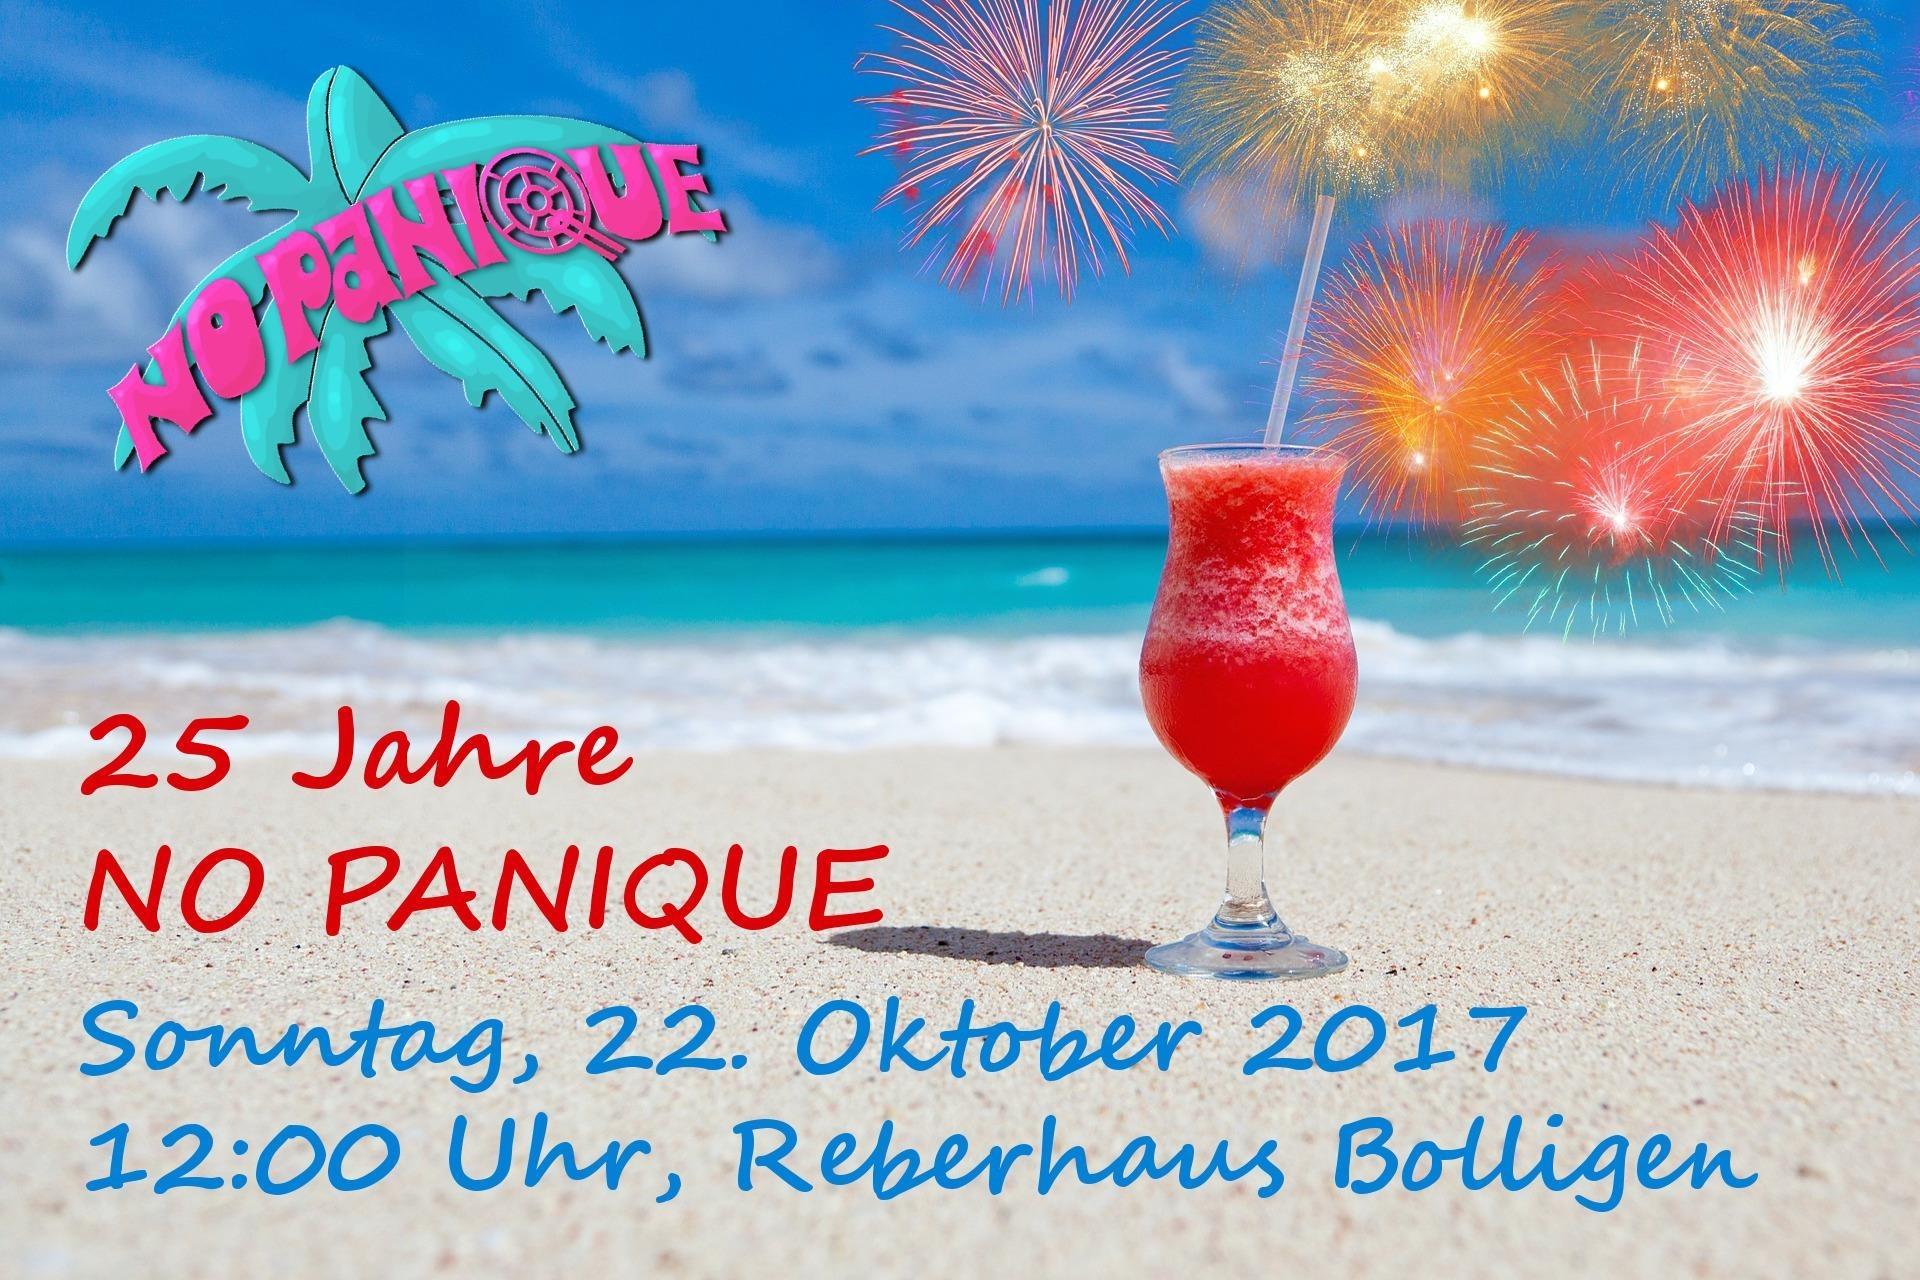 PaniqueEvent am 22. Oktober 2017 im Reberhaus Bolligen